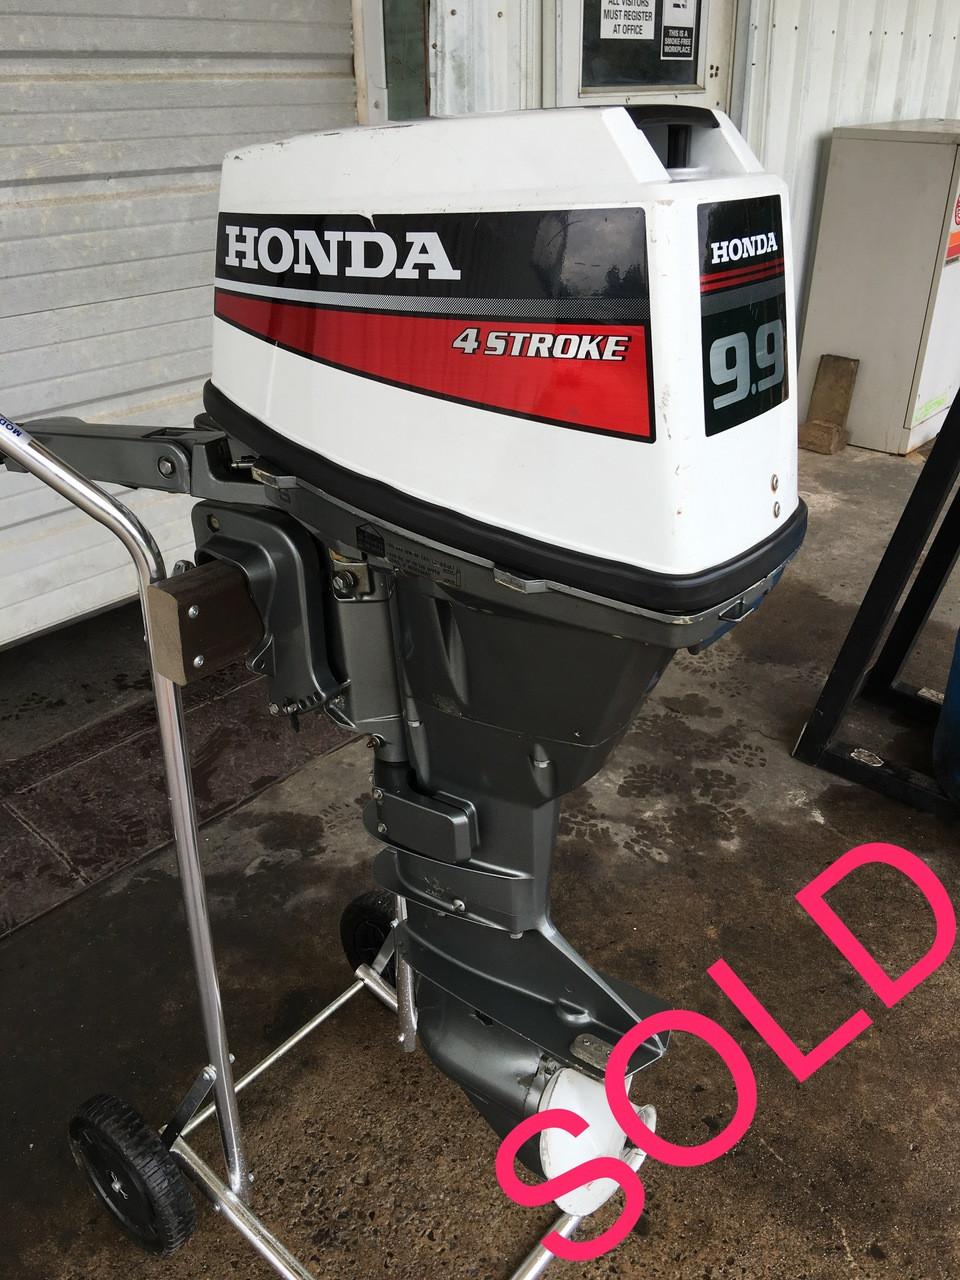 1990 Honda 9.9 HP 2-Cyl 4-Stroke 15 Inch Tiller Outboard Motor